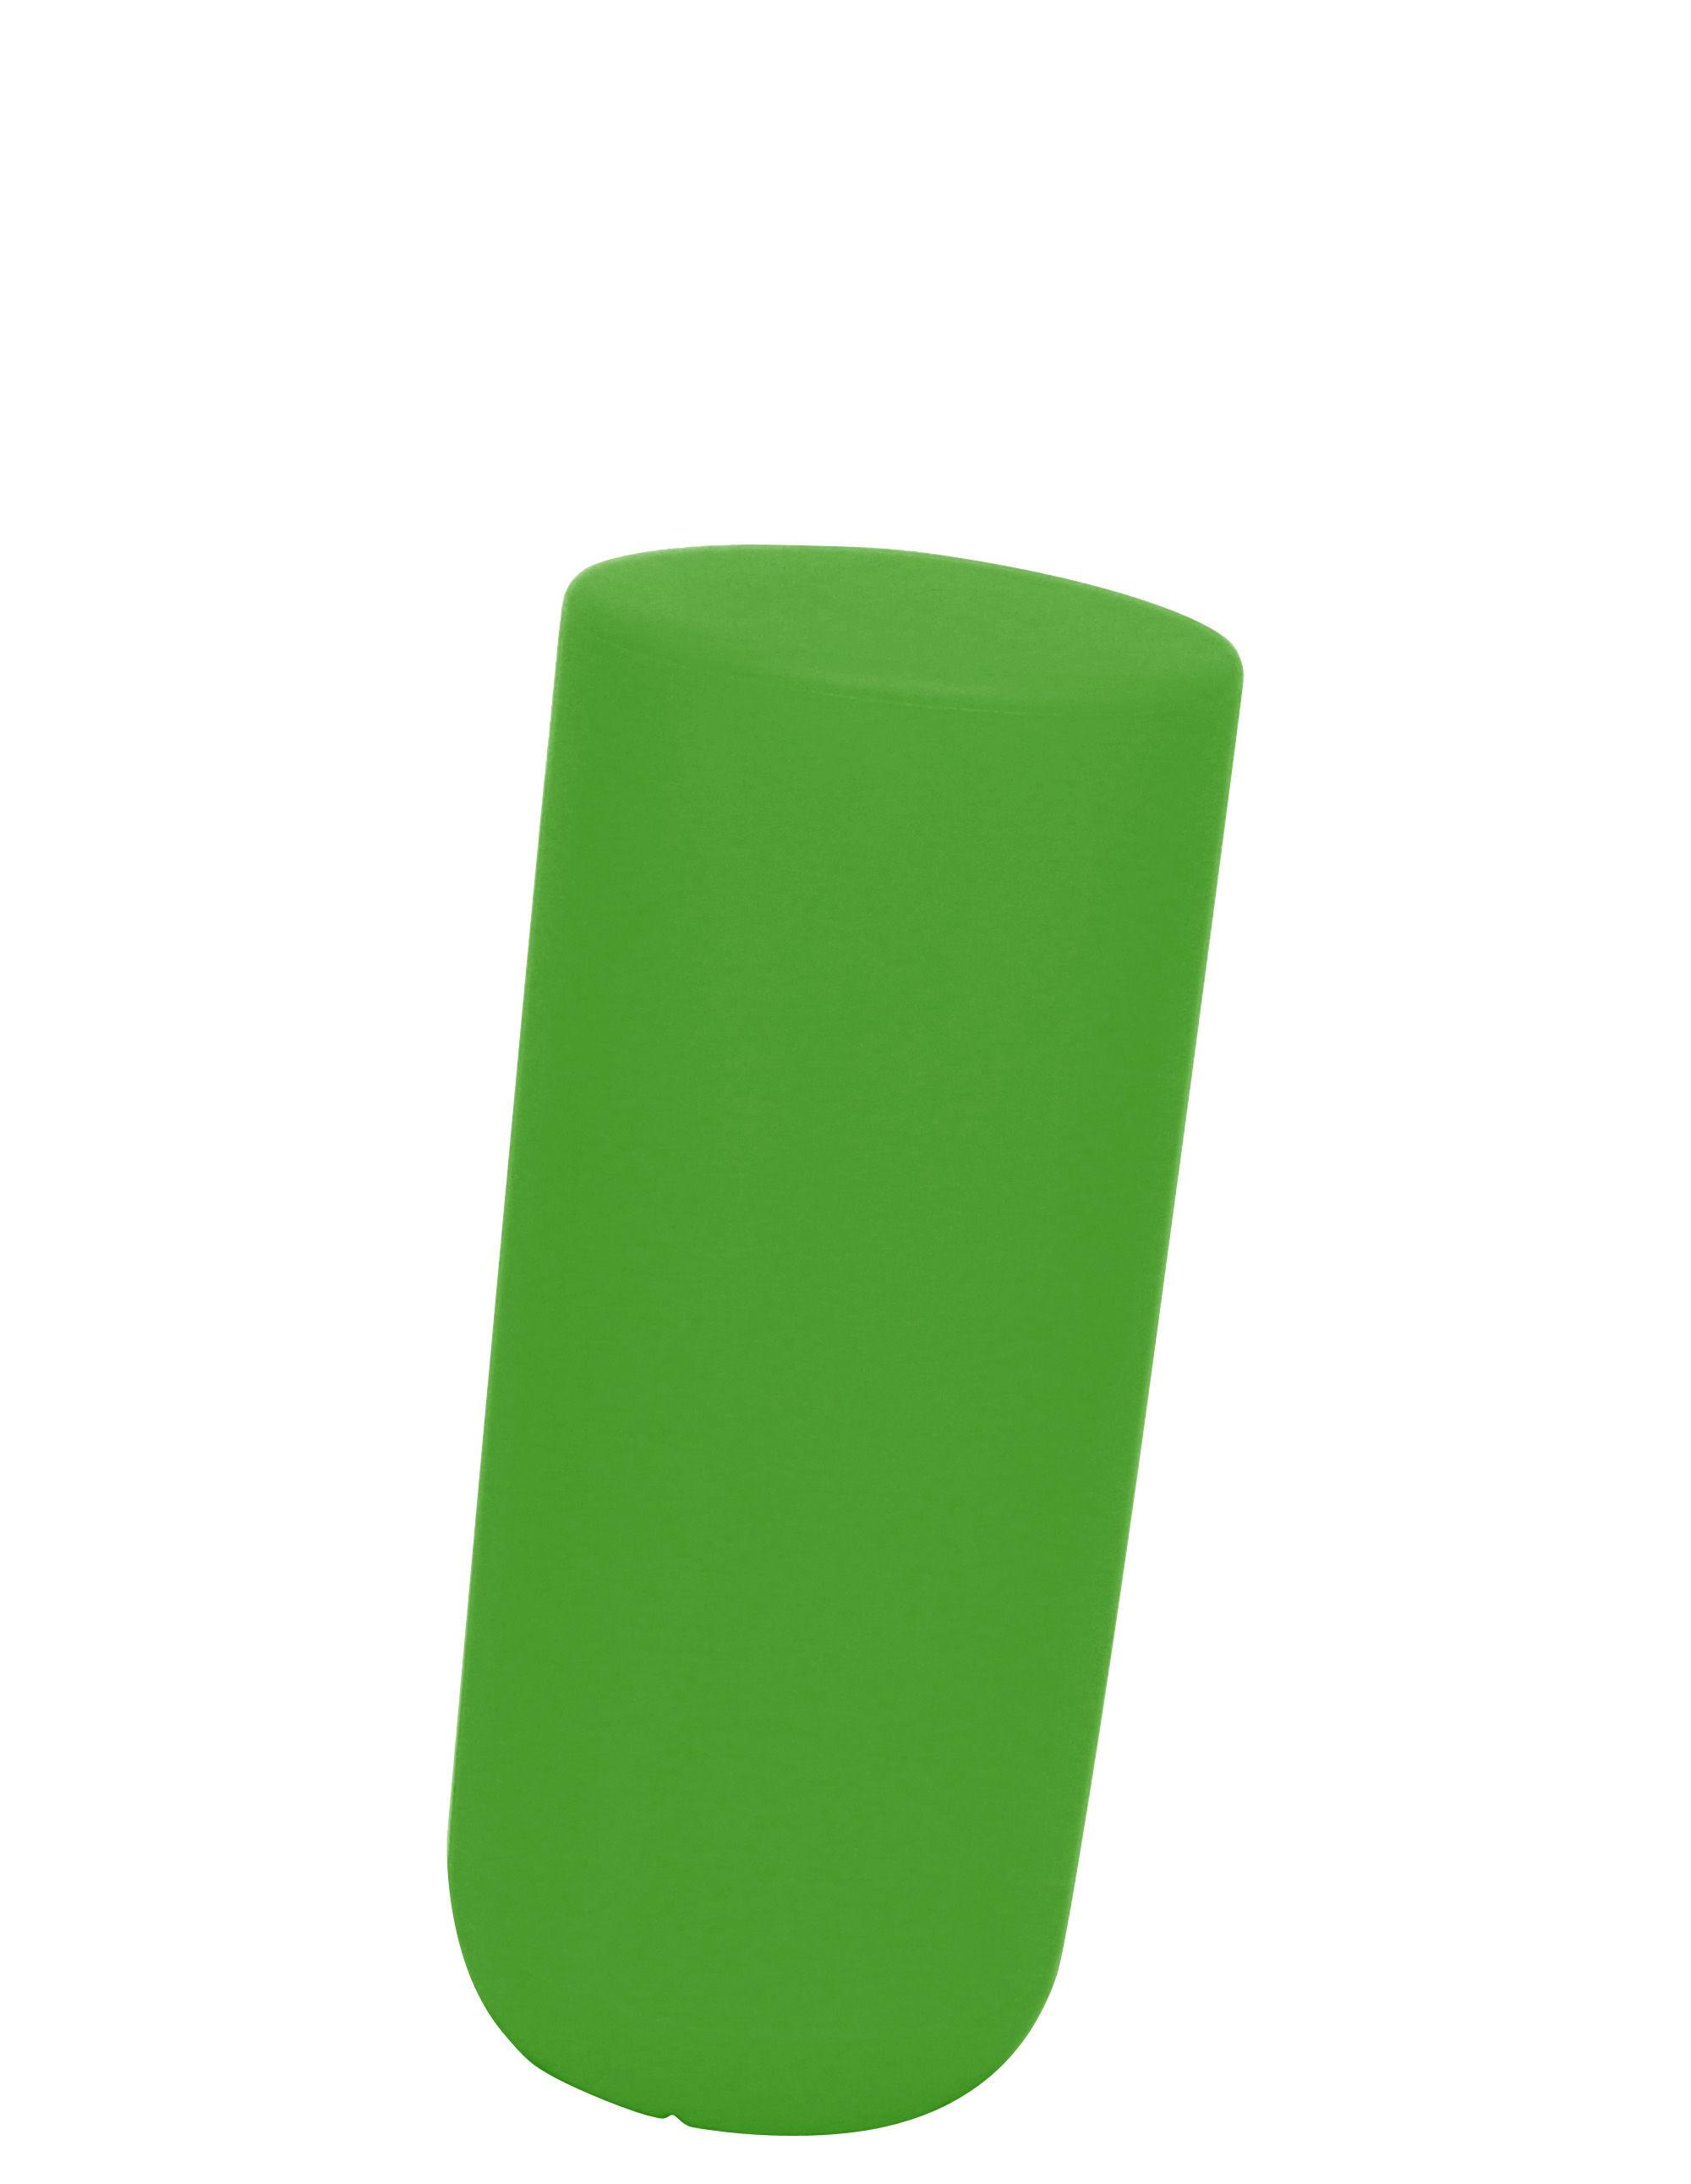 Möbel - Möbel für Teens - Sway Hocker H 50 cm - Thelermont Hupton - Grün - Polyäthylen